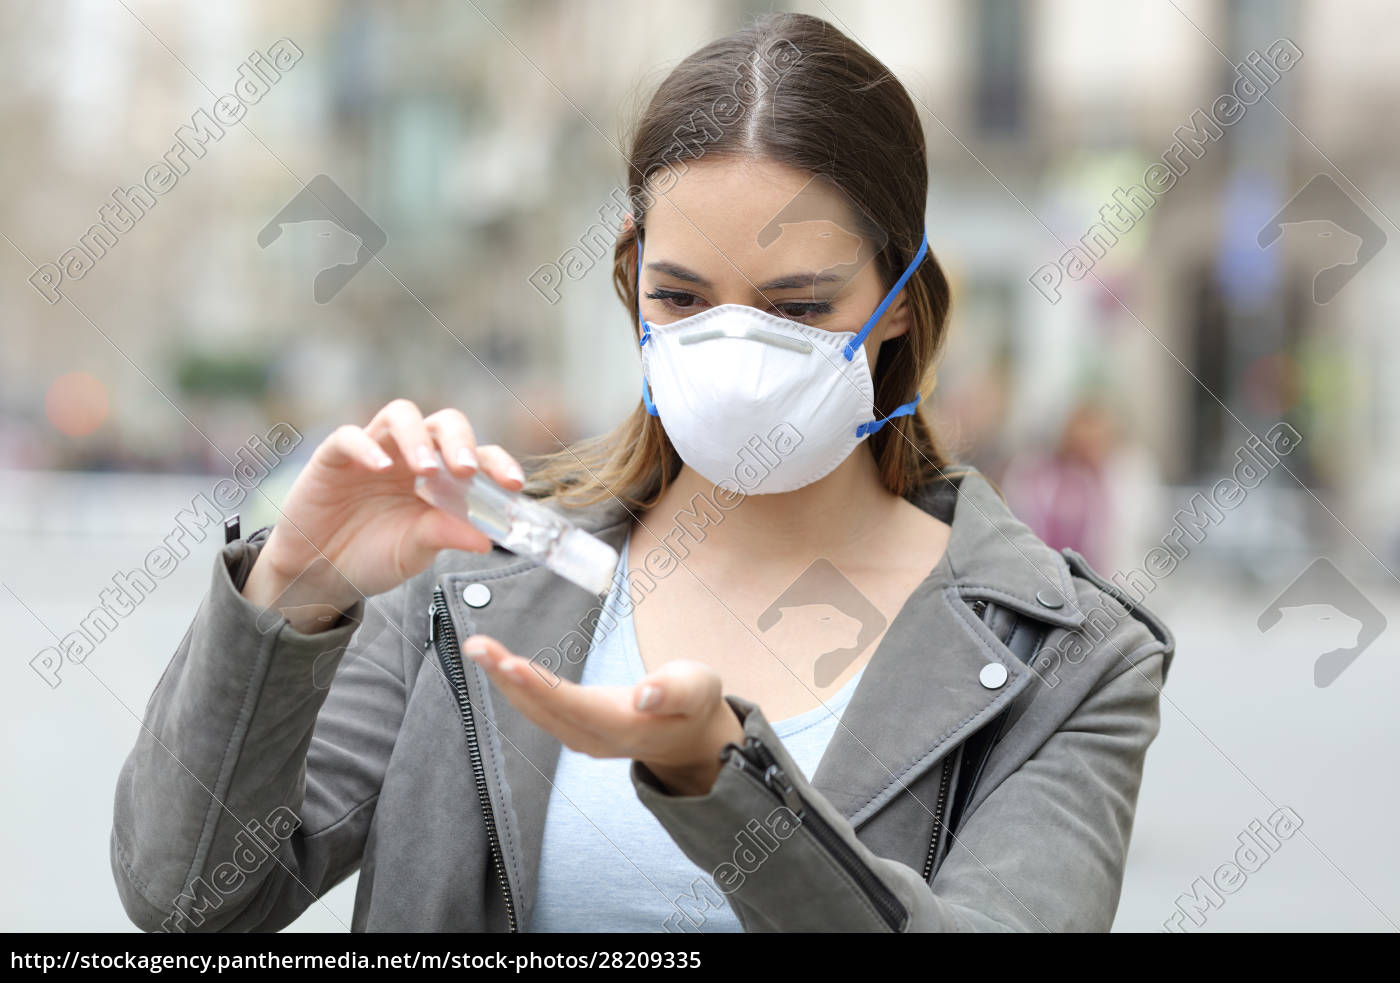 girl, with, mask, applying, hand, sanitizer - 28209335